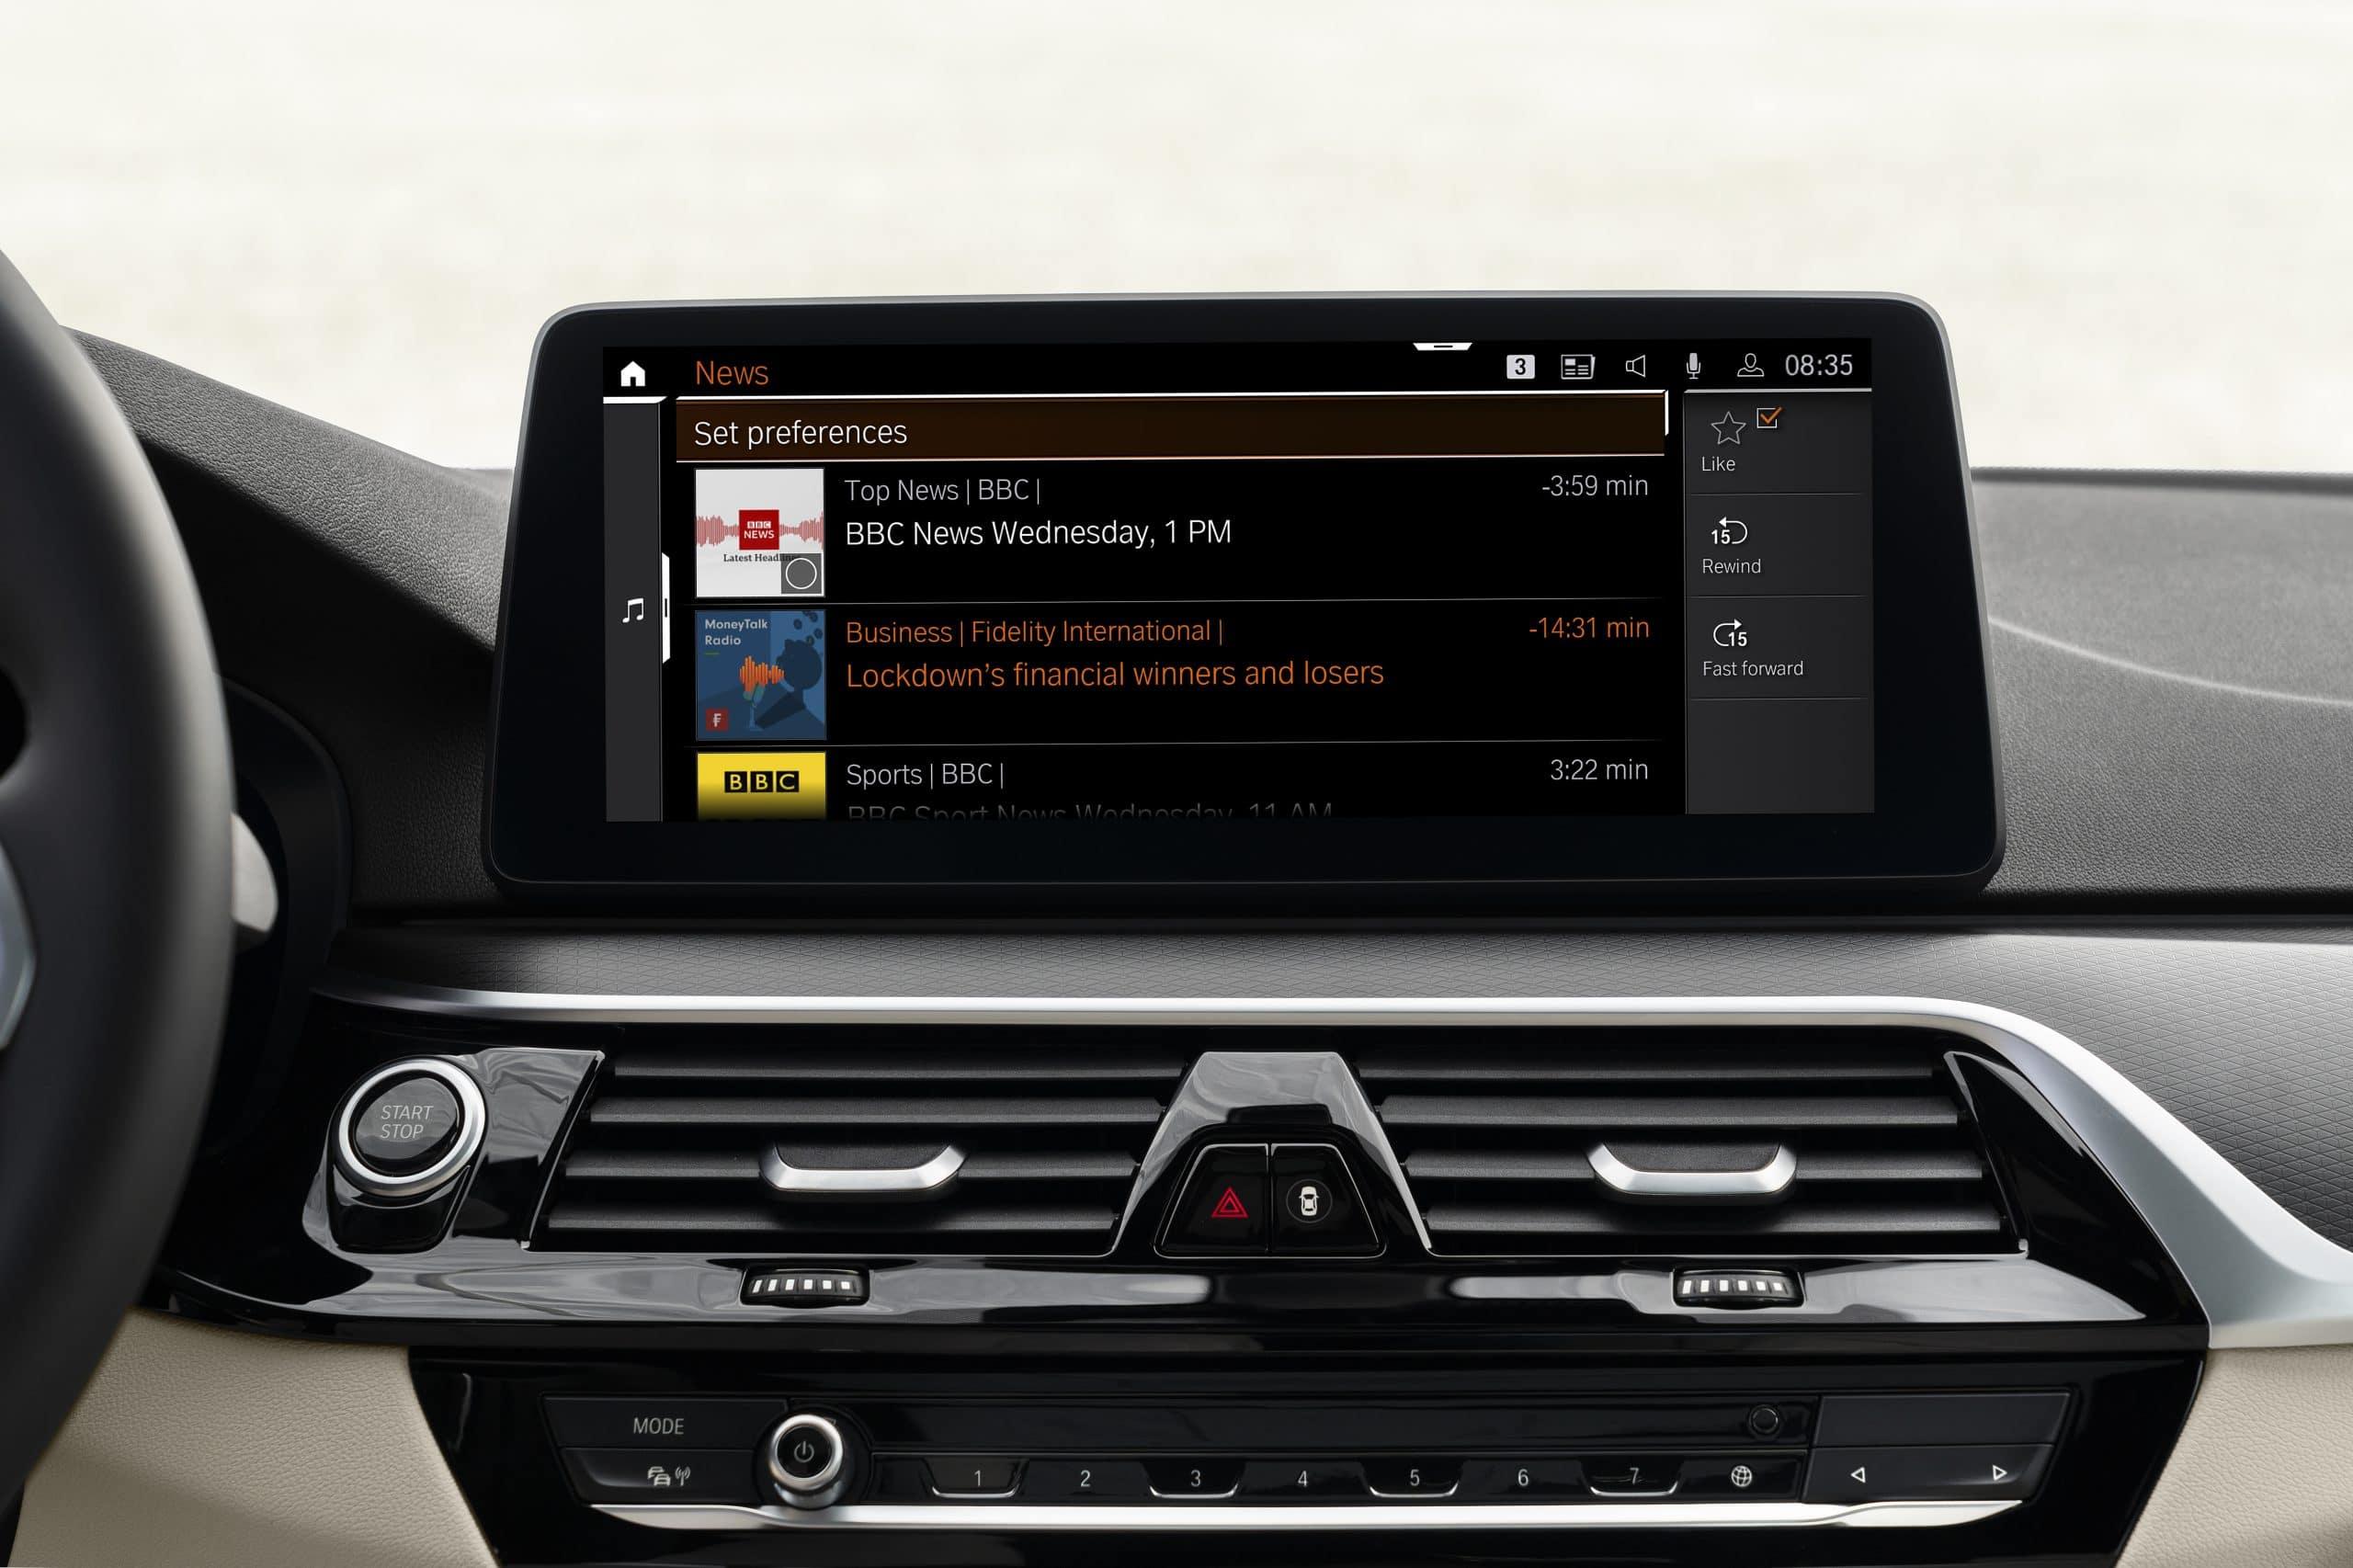 P90429970 highRes scaled Ειδήσεις σε πραγματικό χρόνο με την εφαρμογή BMW News BMW, BMW News, BMW News app, News app, ειδήσεις, Νέα